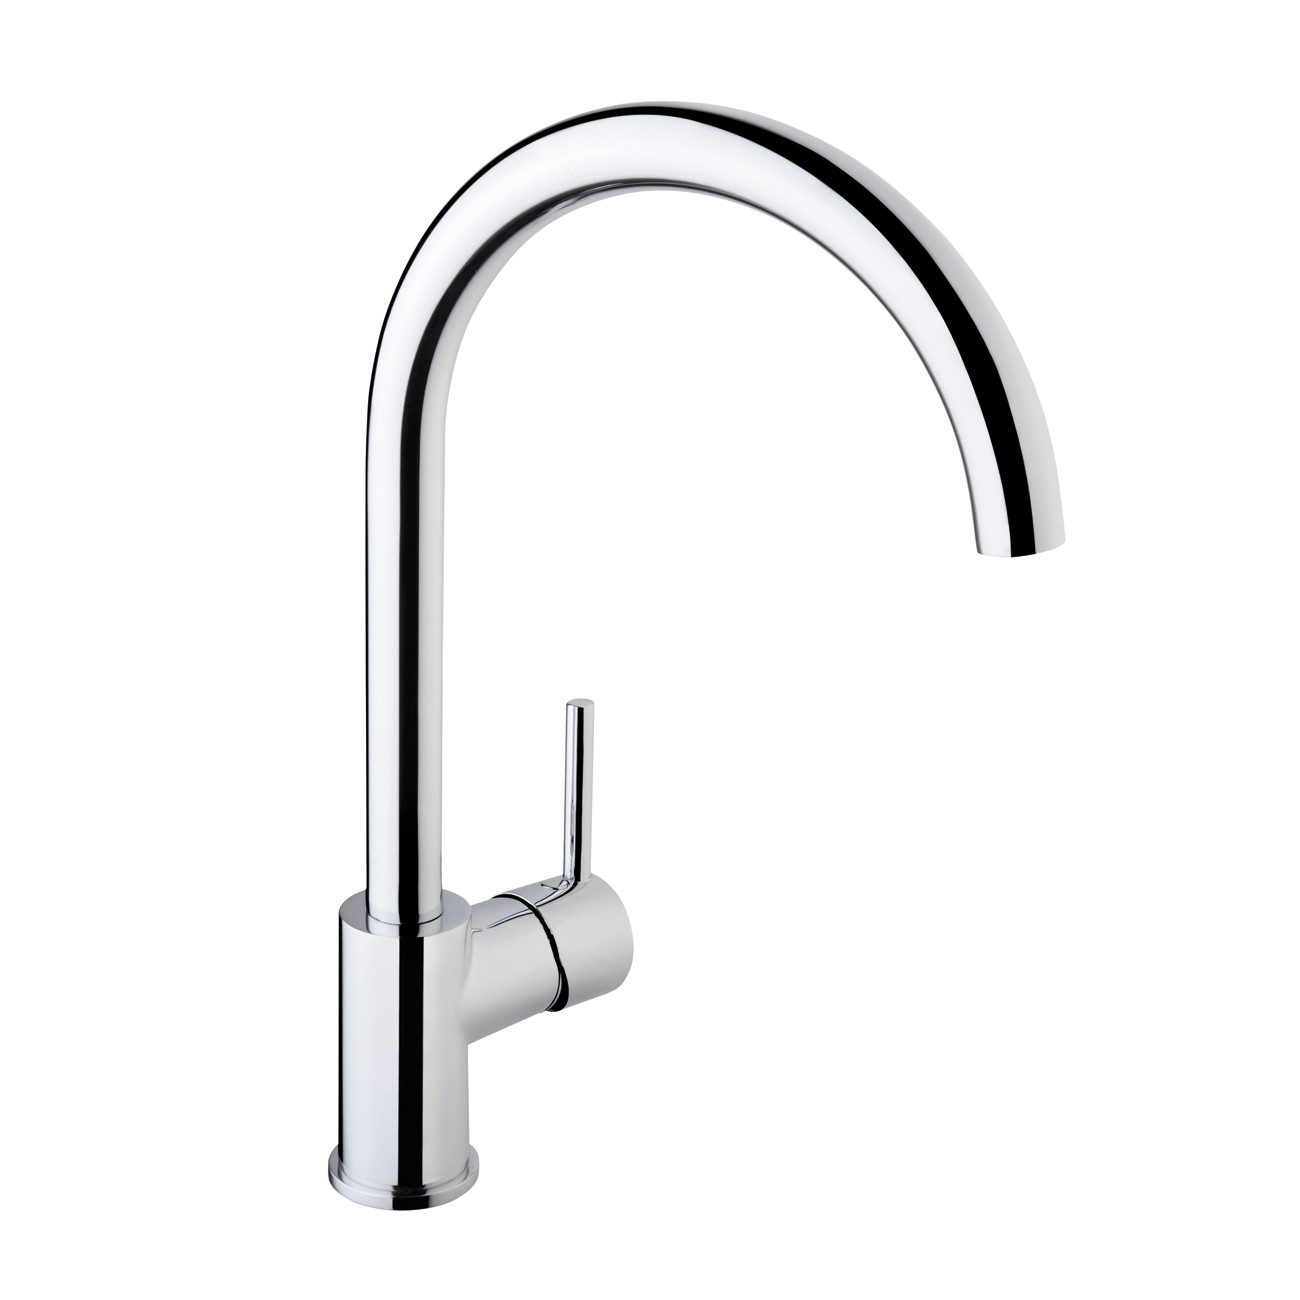 vitra_minimax-s_kitchen-tapware_sink-mixer_121114_1